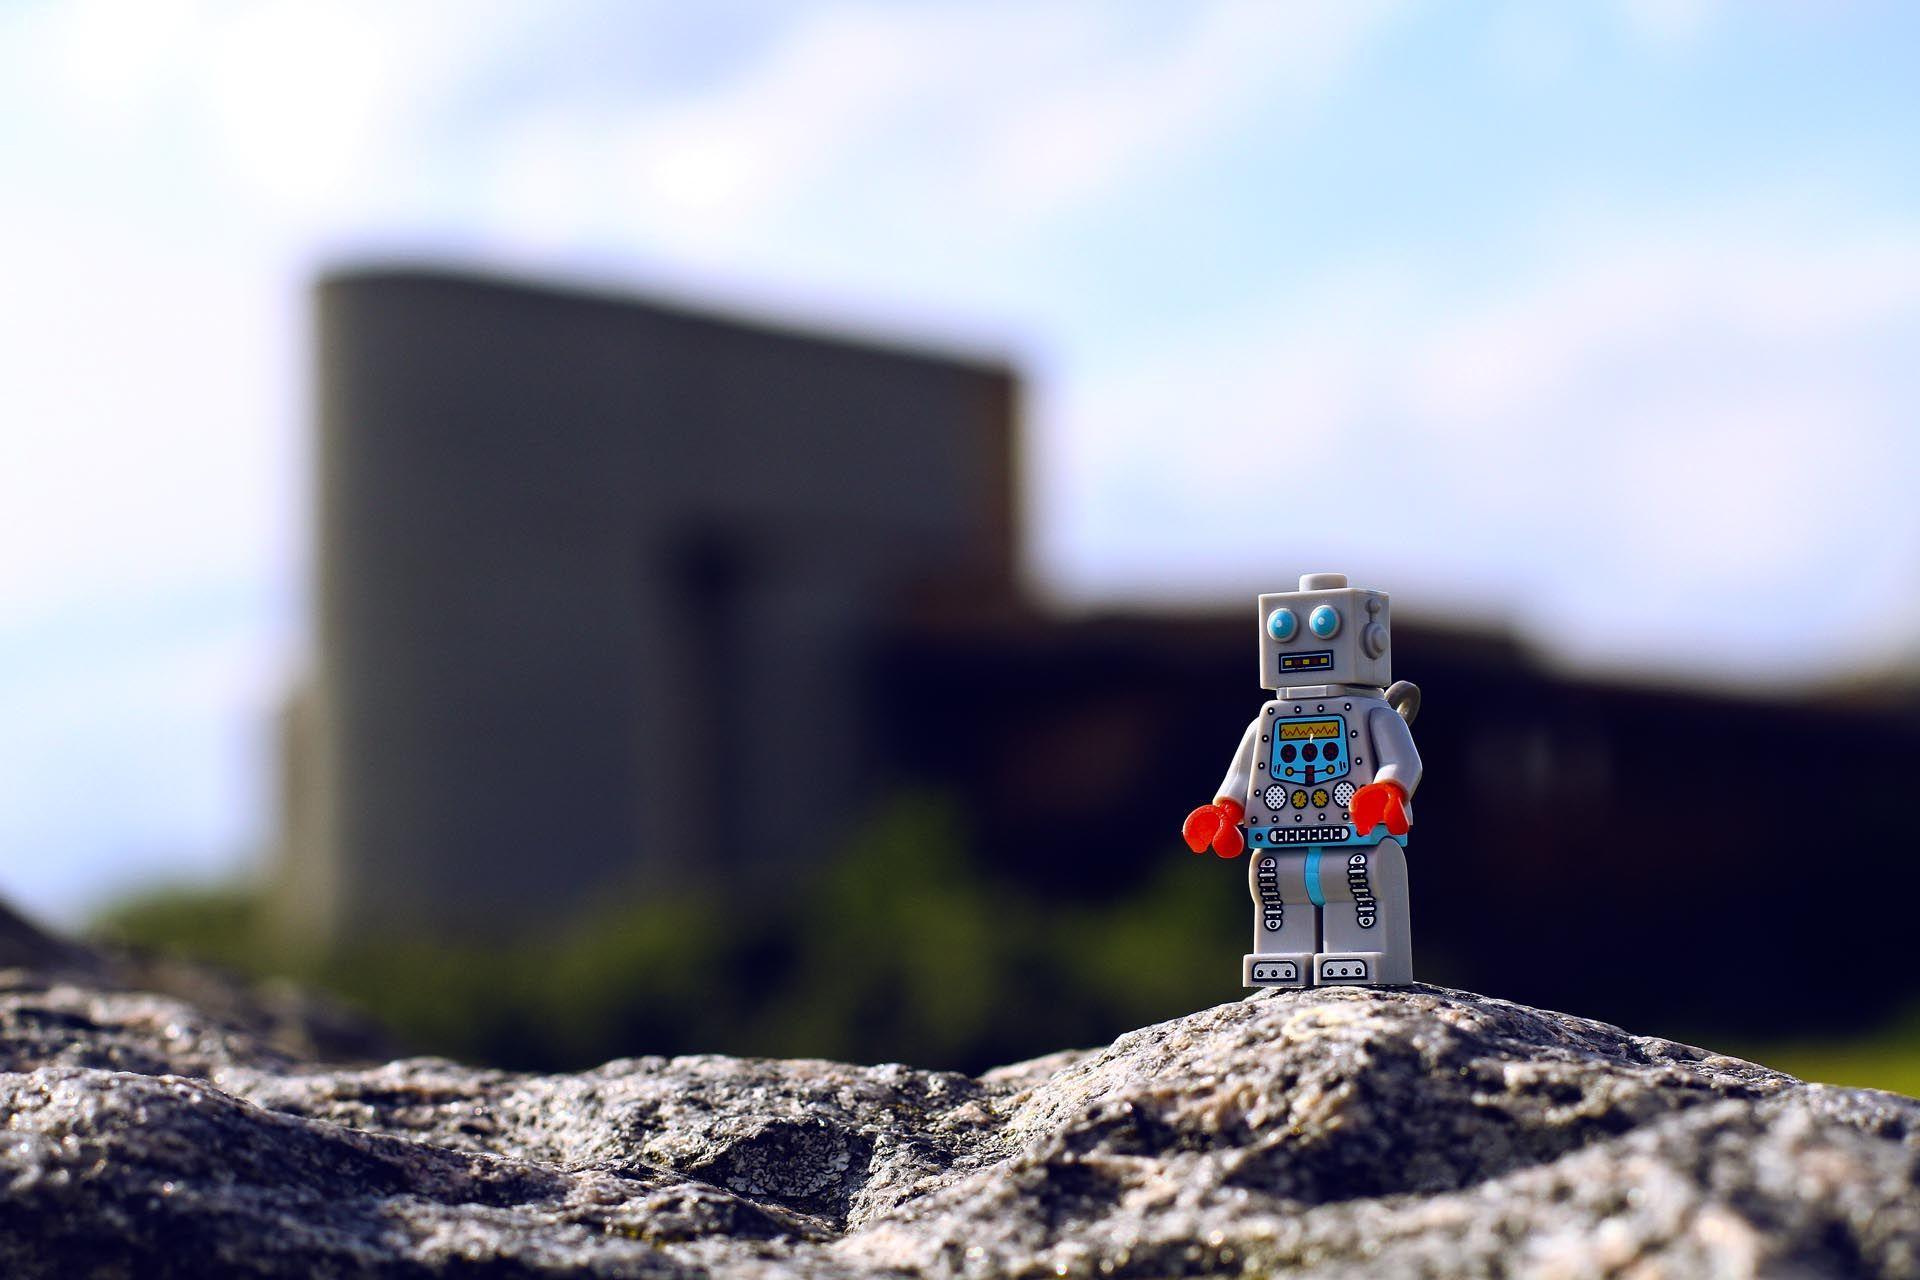 Robot Wallpaper Hd Lego Minifigures Photo Wallpapers